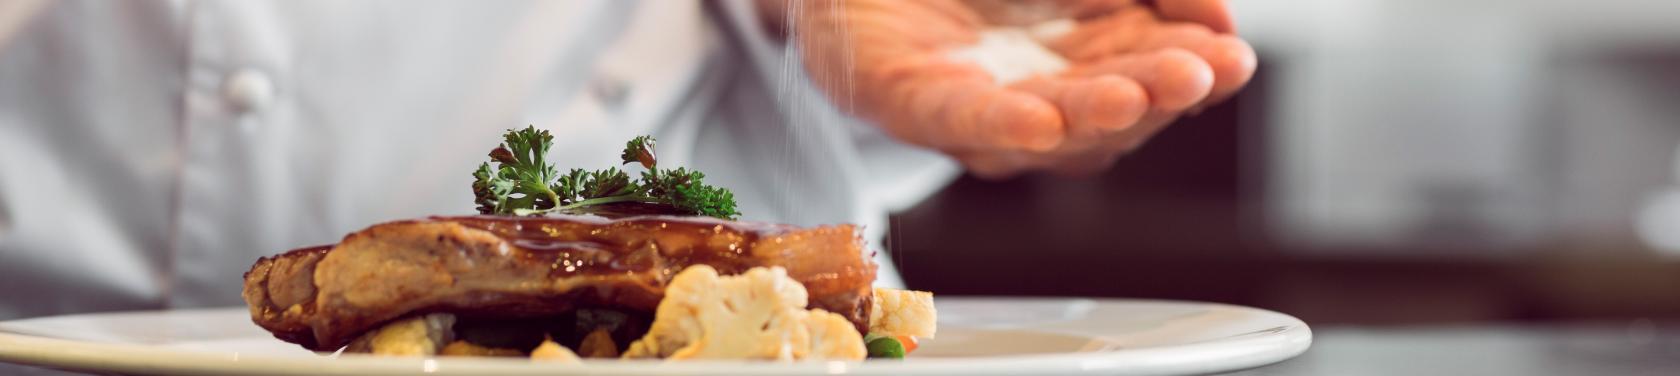 restaurants empordà hostaleria